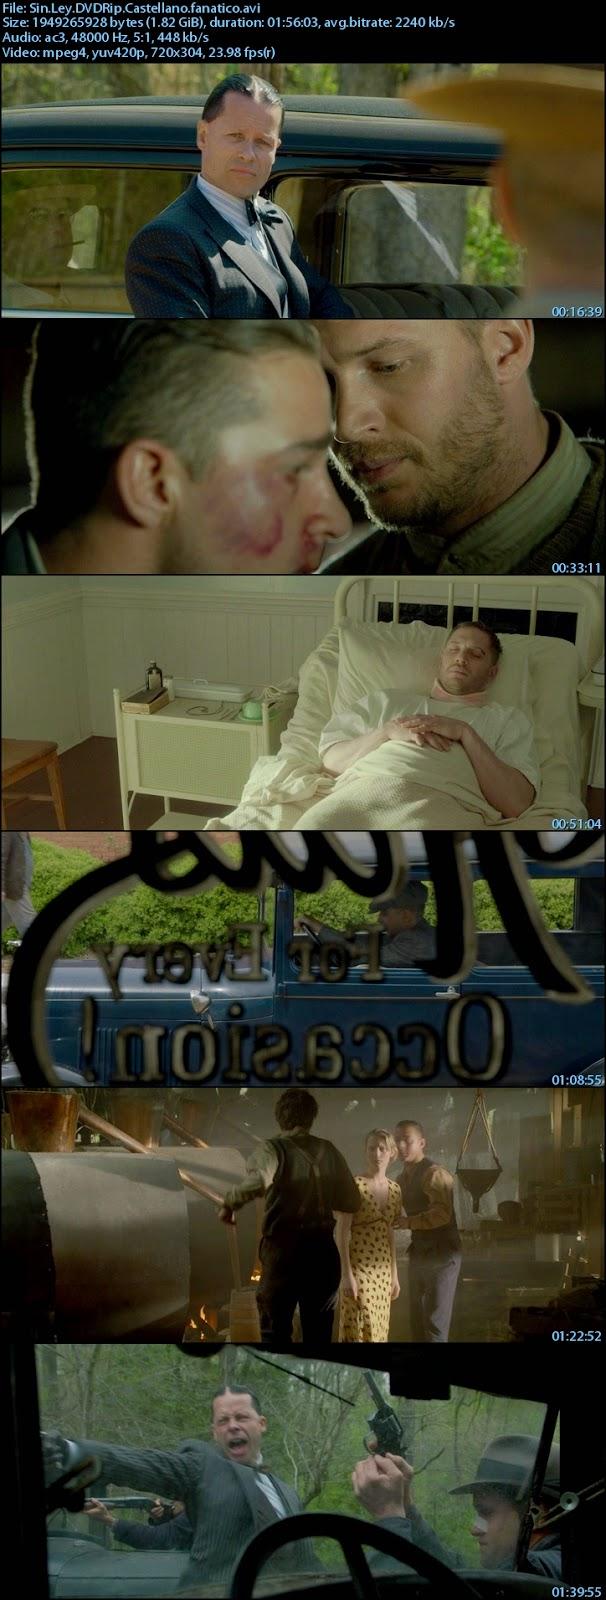 SinLeyDVDRipCastellanofanatico s - Sin ley (Lawless) (2012) [DVDRip XviD][Castellano AC3 5.1][Thriller. Drama]